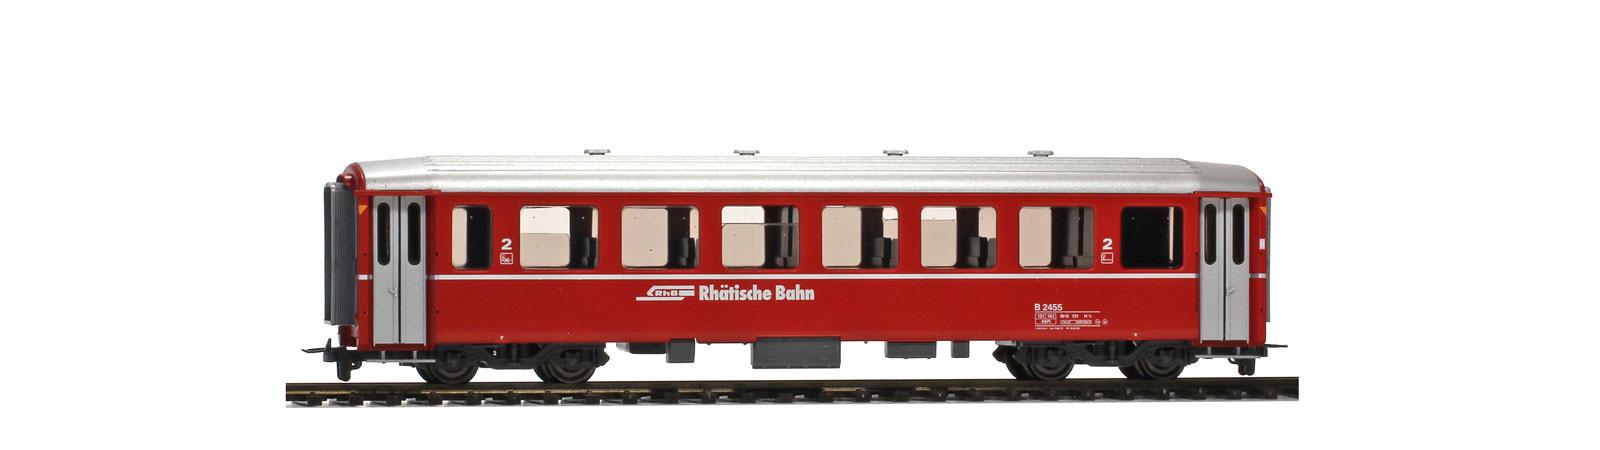 3255135 RhB B 2455 EW I Berninabahn rot-1